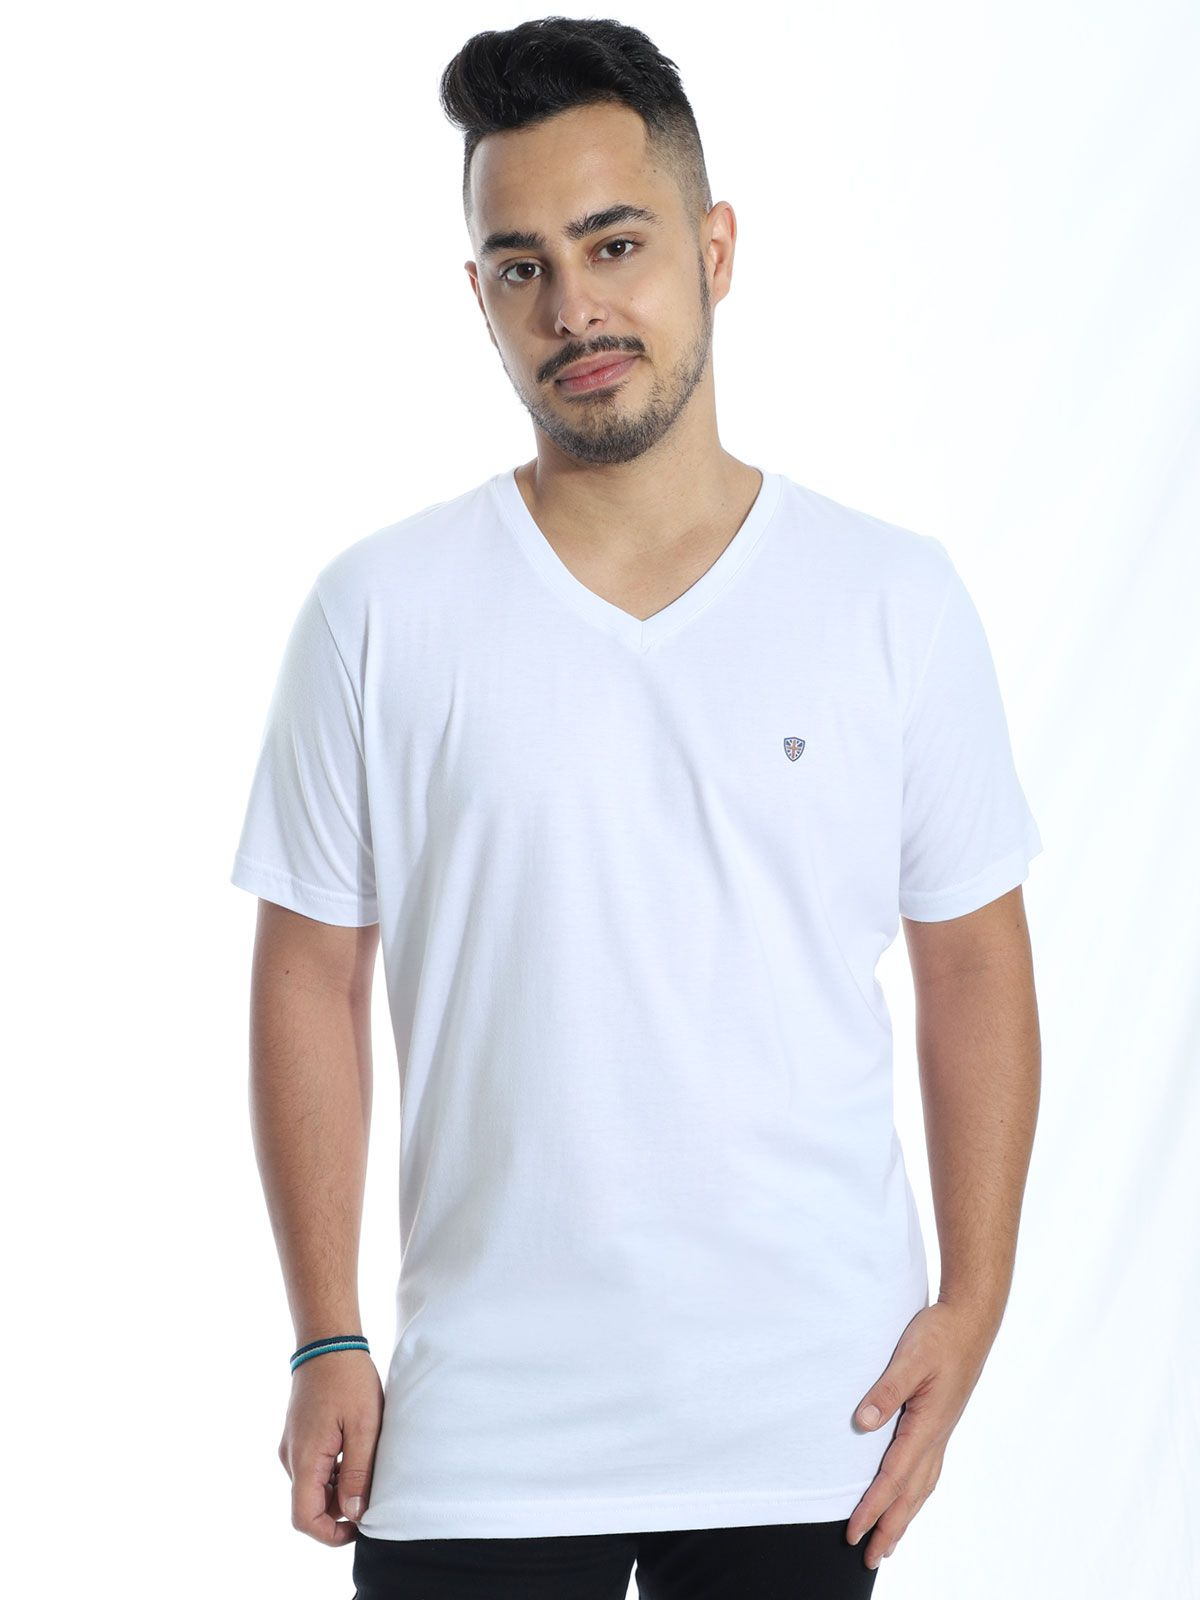 Camiseta Masculina Básica Decote V. Anistia Kingdom Branco